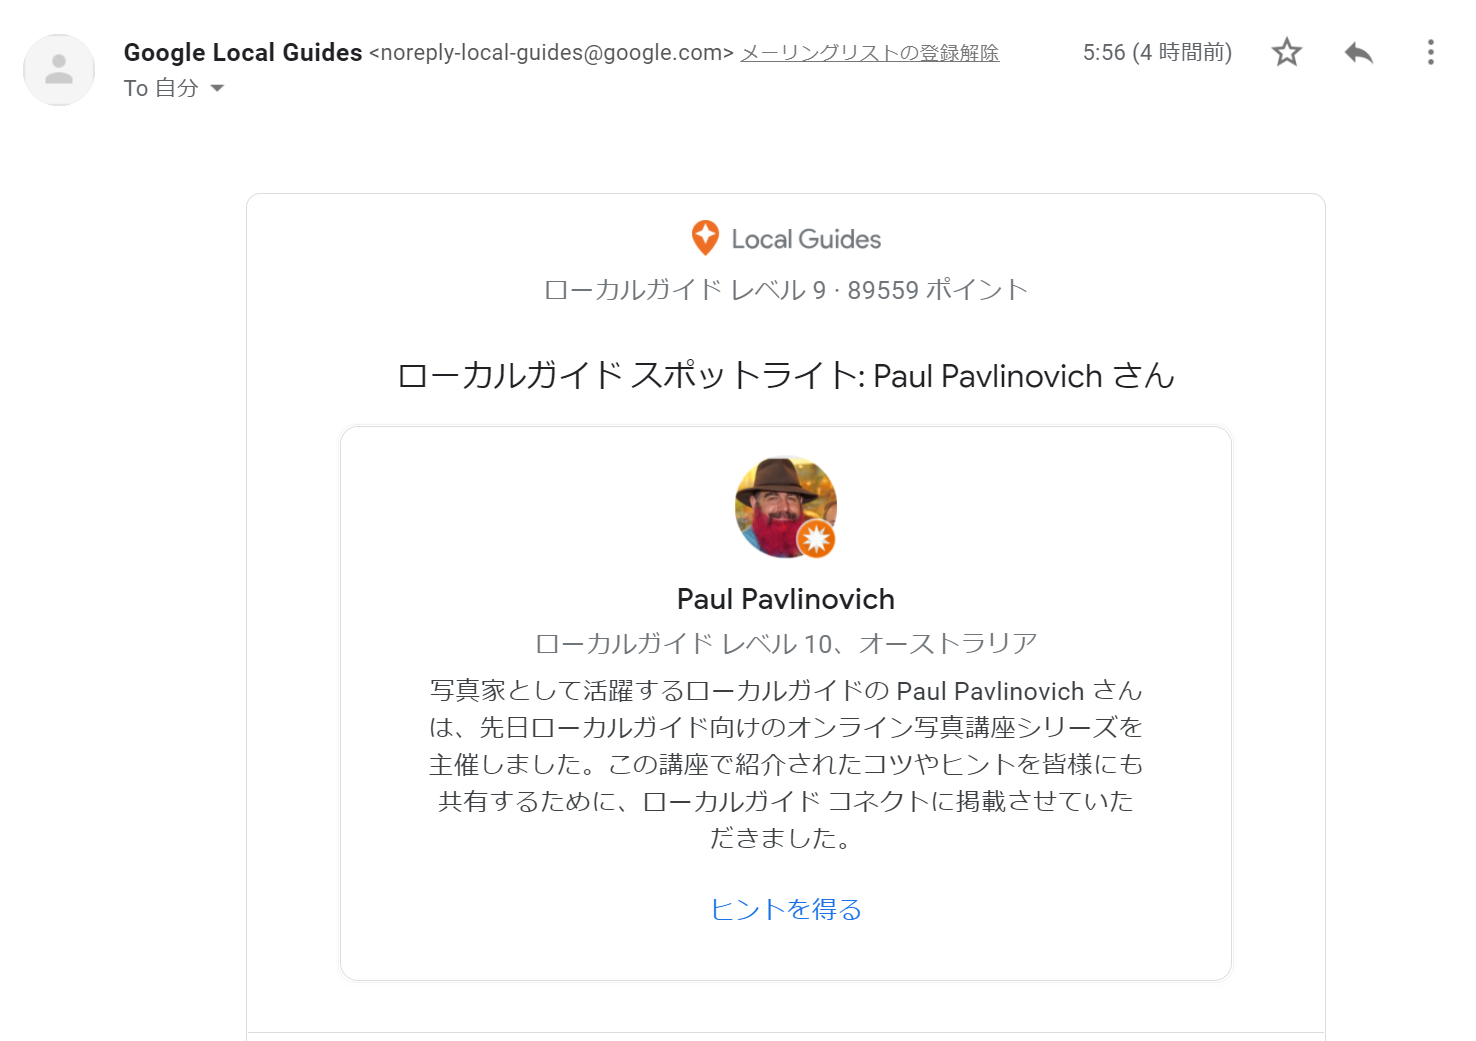 PaulPavlinovich